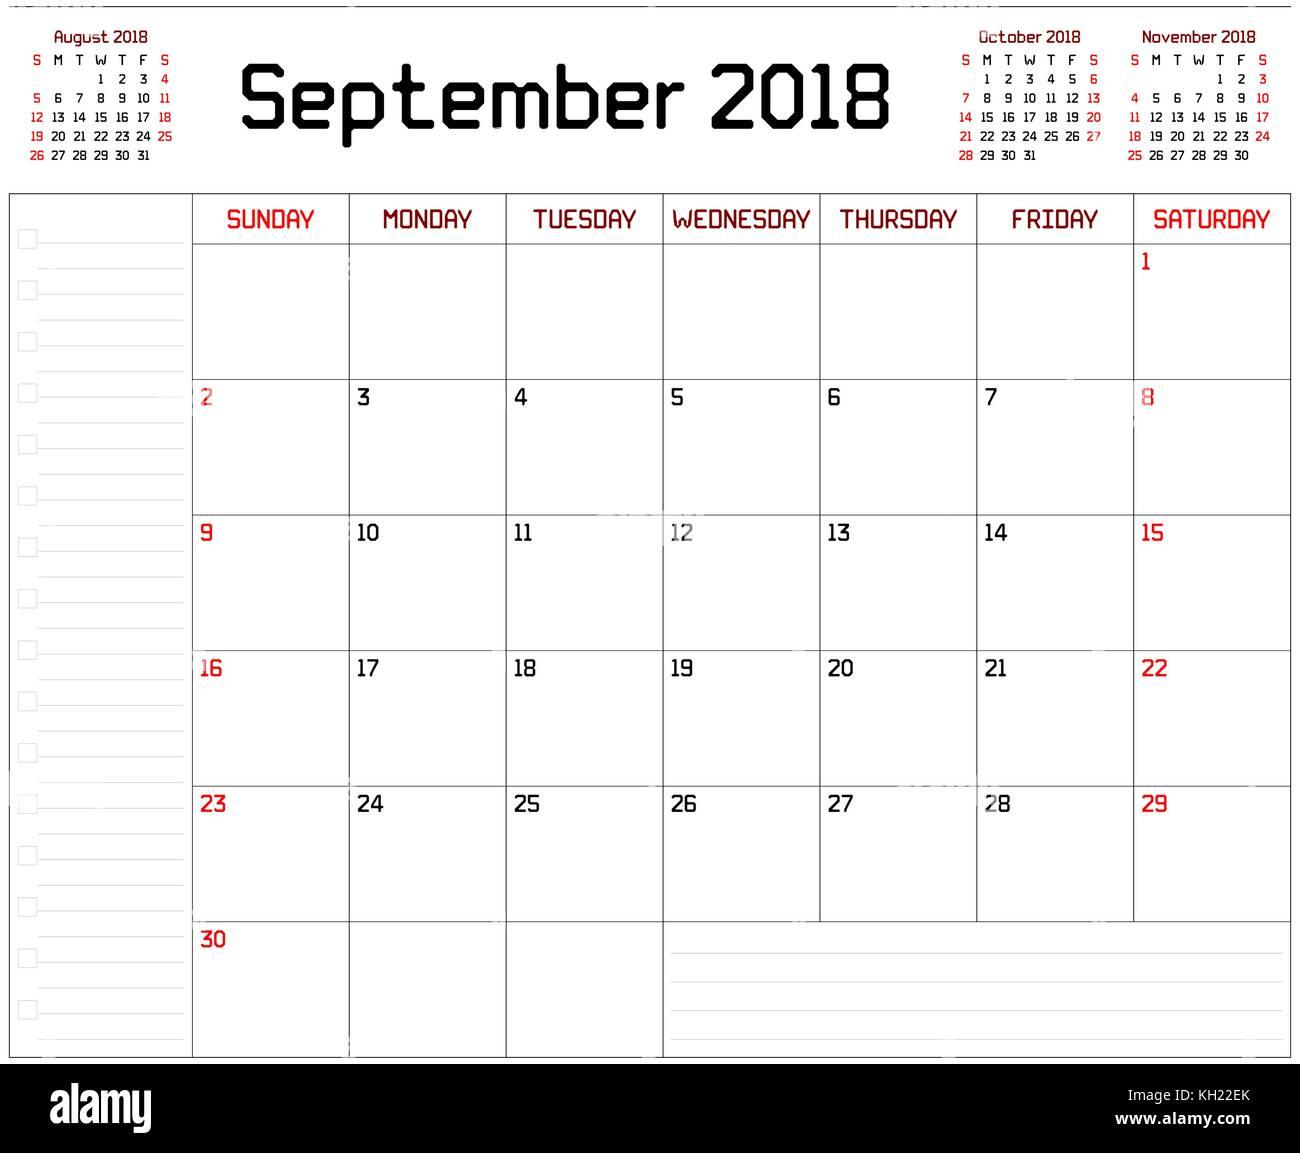 b0e3bcc1676ea Año 2018 Septiembre planner - Planificador mensual calendario de septiembre  de 2018 sobre un fondo blanco